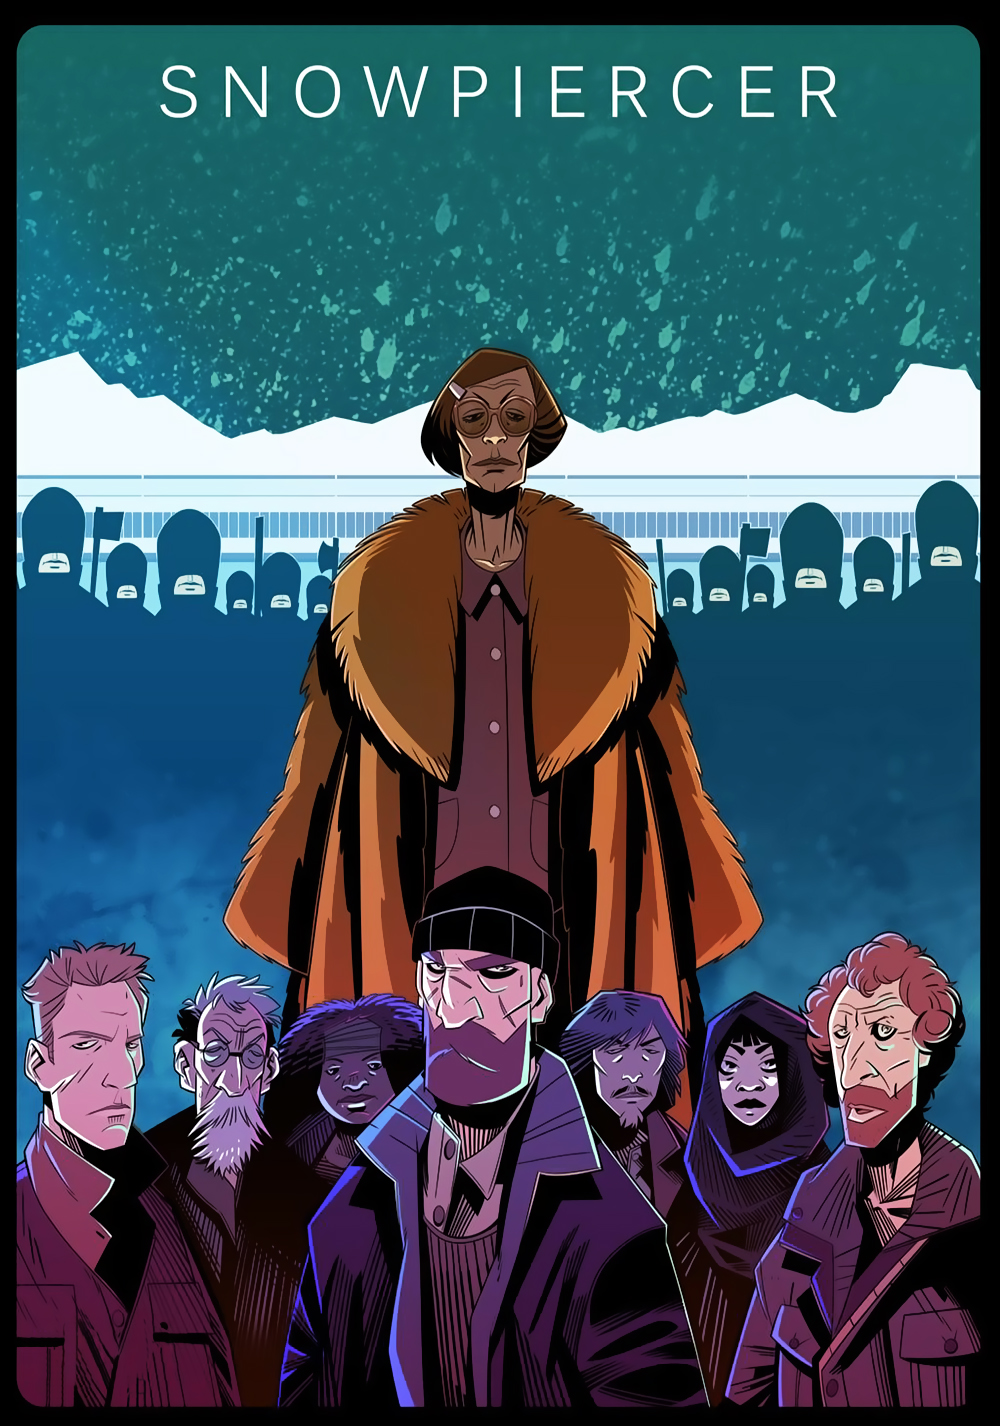 Snowpiercer | Movie fanart | fanart.tv